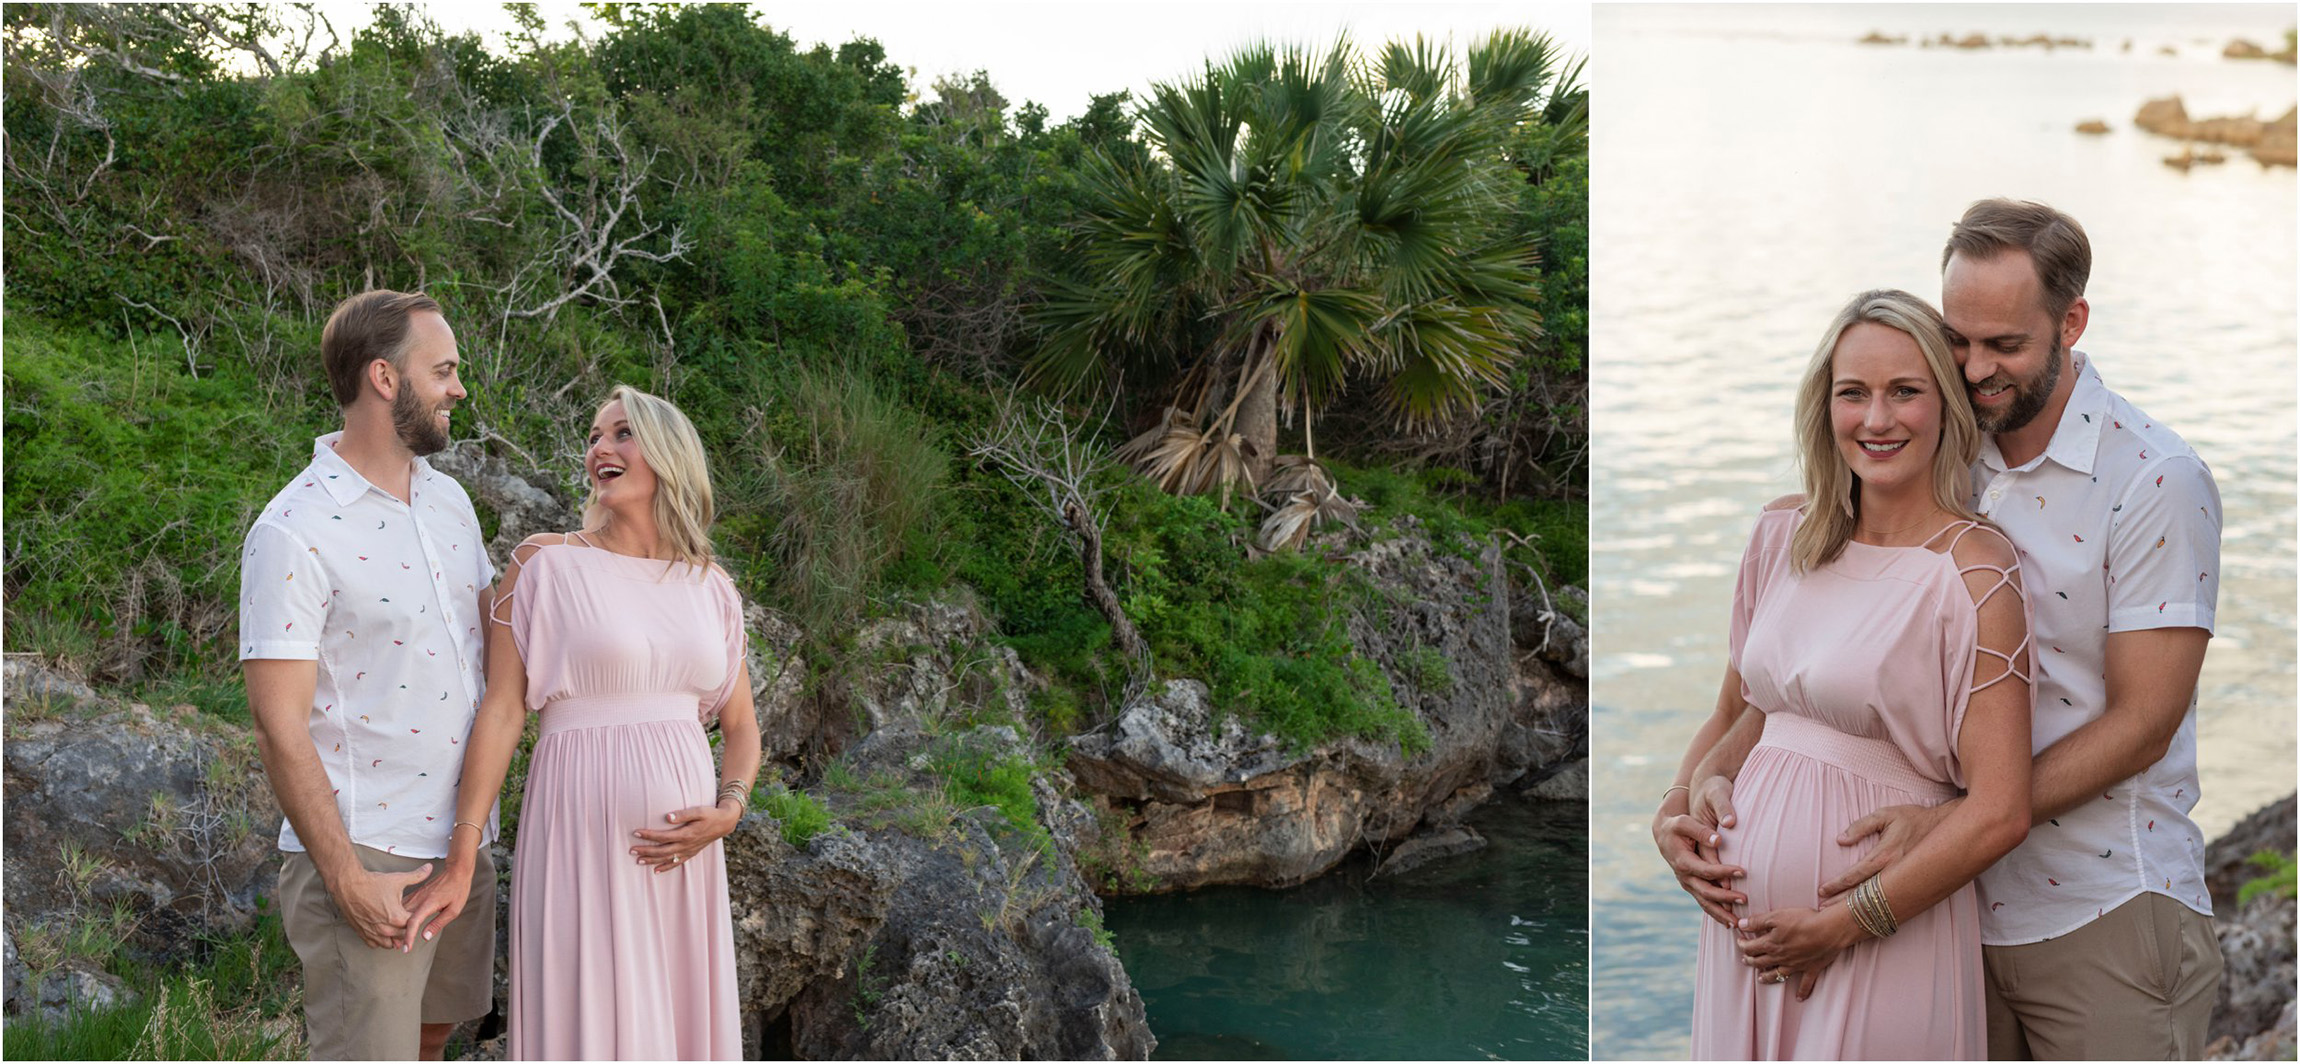 ©FianderFoto_Bermuda_Tom Moore's Jungle_Proposal Maternity Photographer_Erika_Andy_017.jpg